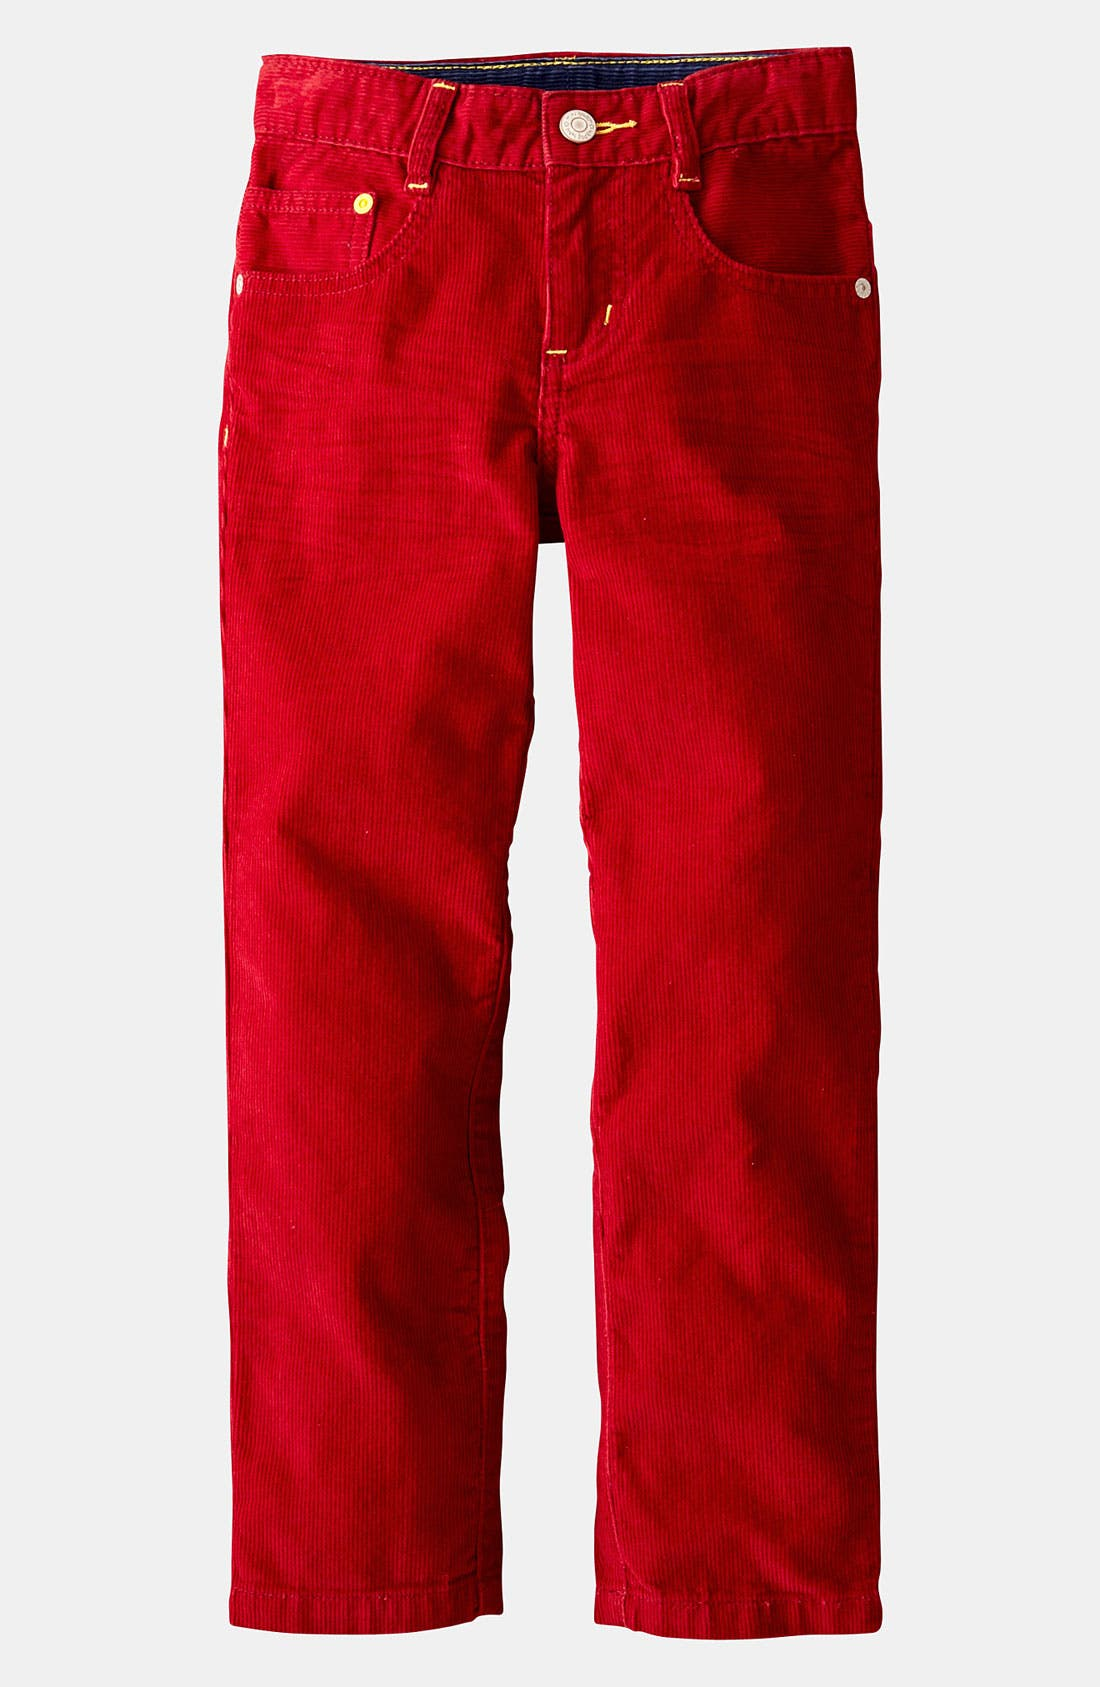 Alternate Image 1 Selected - Mini Boden 'Preppy' Slim Corduroy Pants (Toddler)